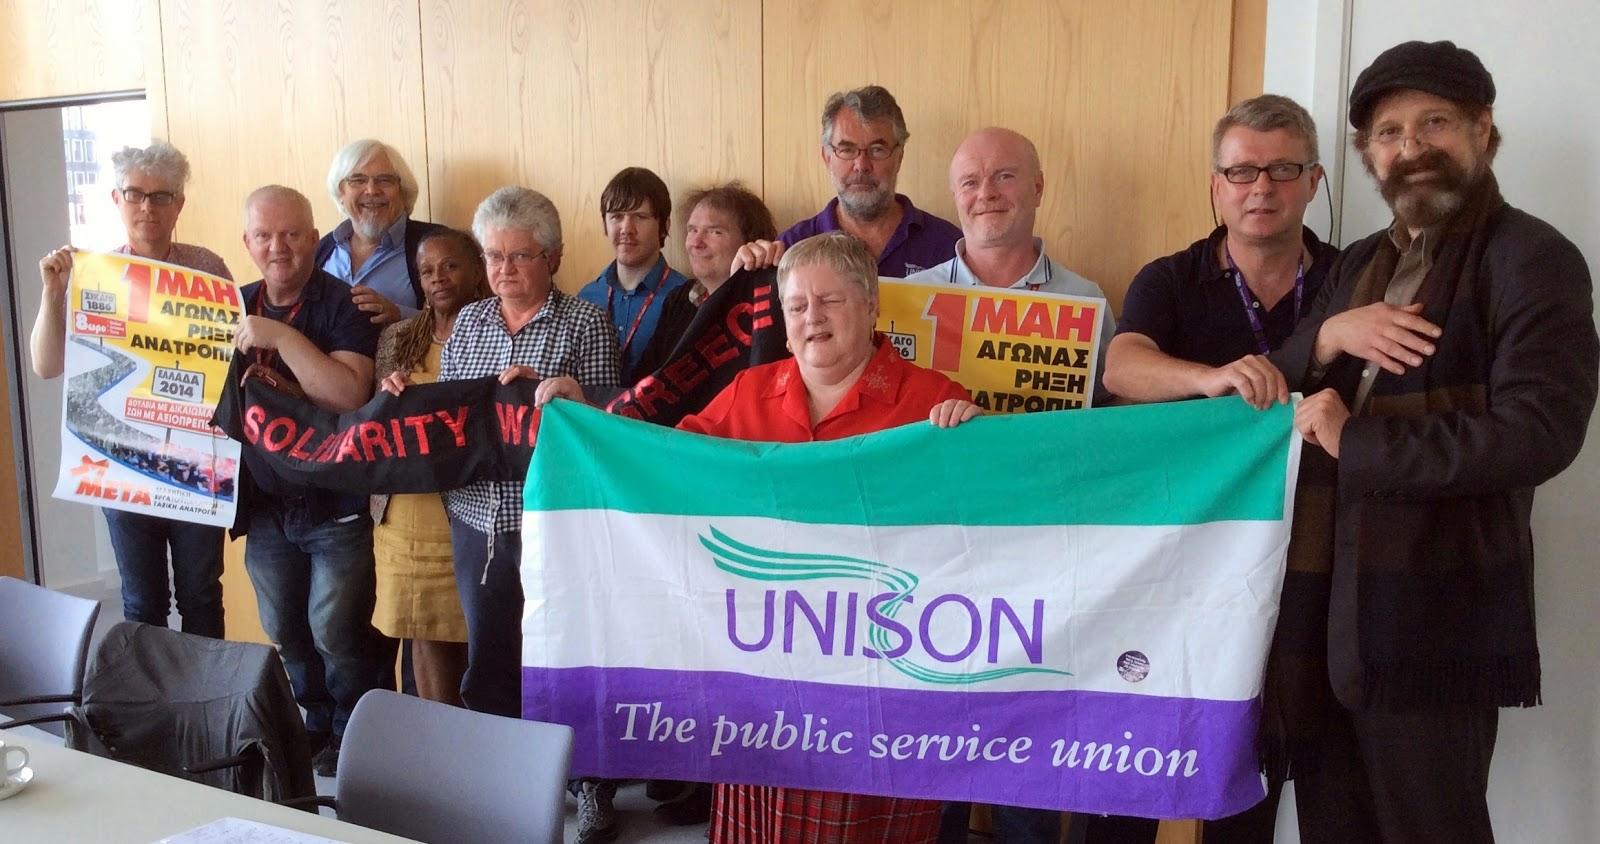 John's Labour blog: Greater London UNISON international